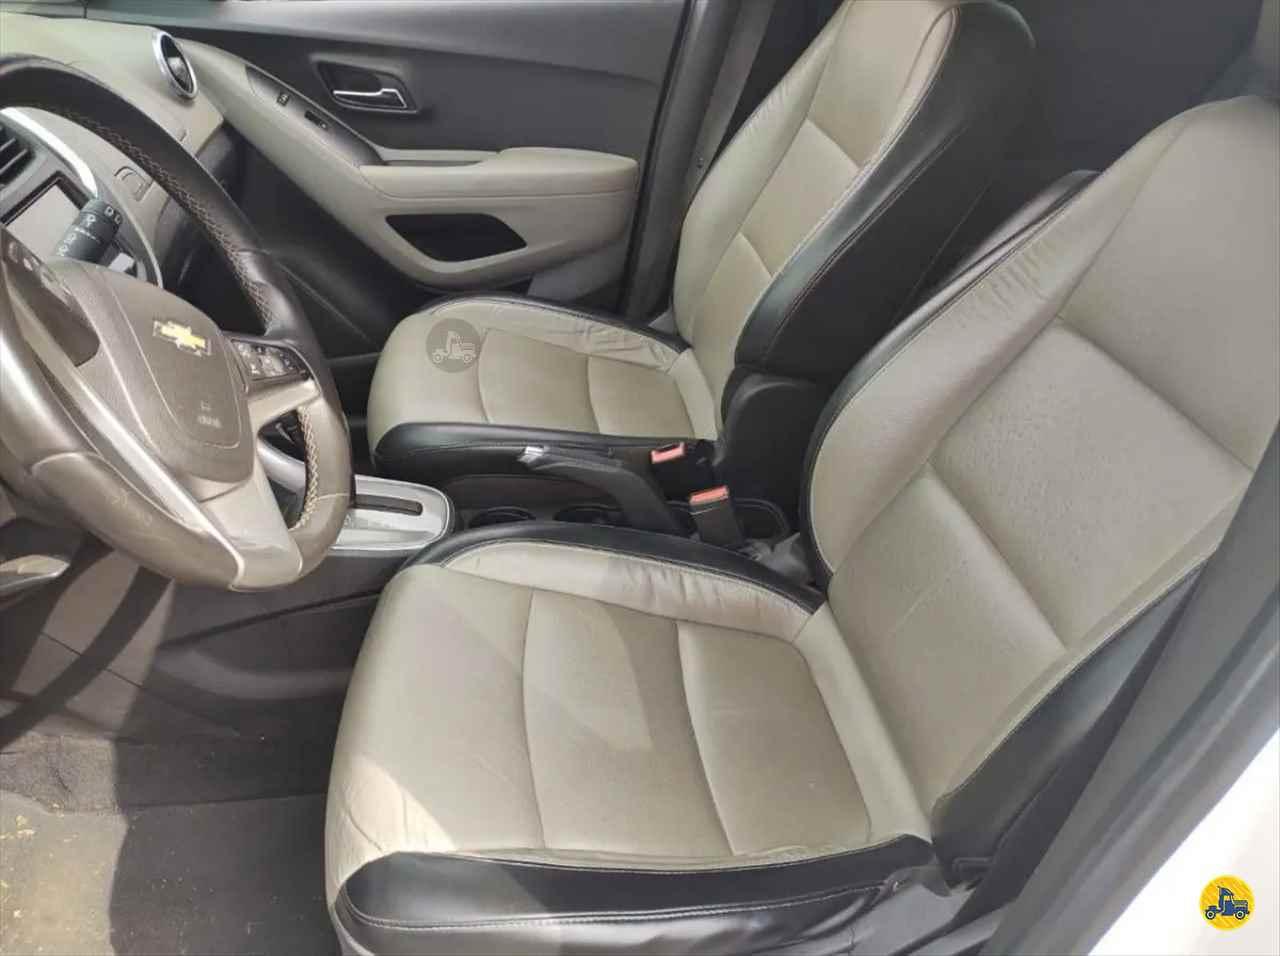 GM - Chevrolet Tracker 1.8 LTZ 85000km 2014/2014 Maracavel Londrina Caminhões